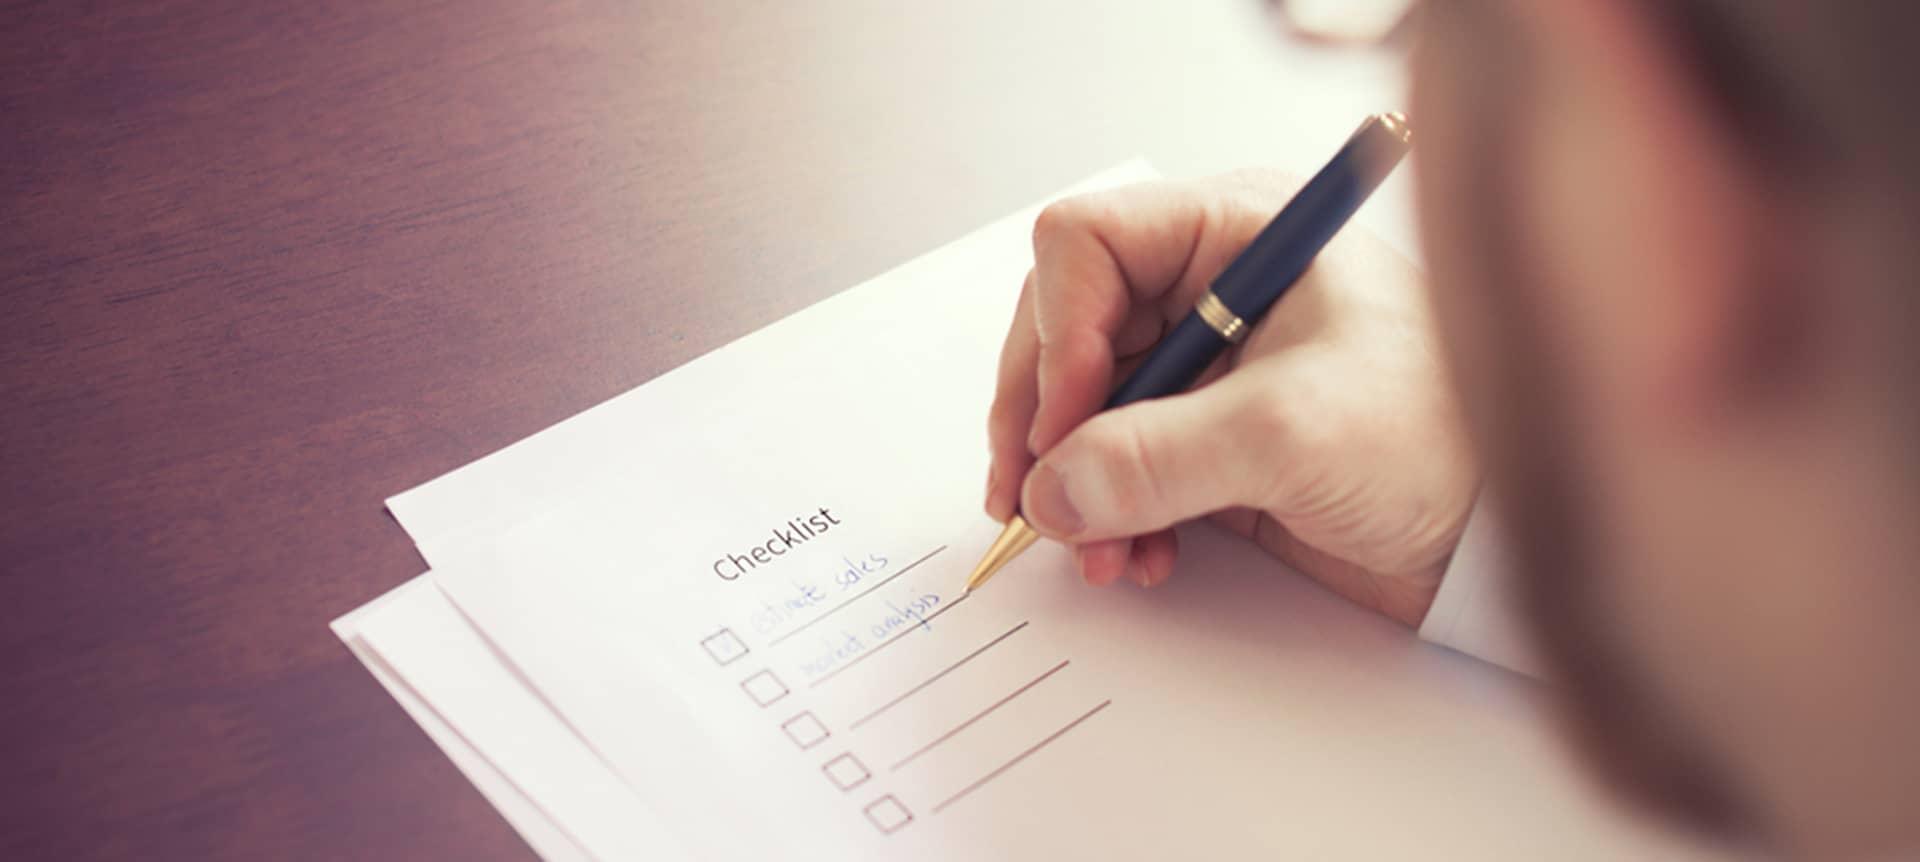 Recruiter writing a checklist